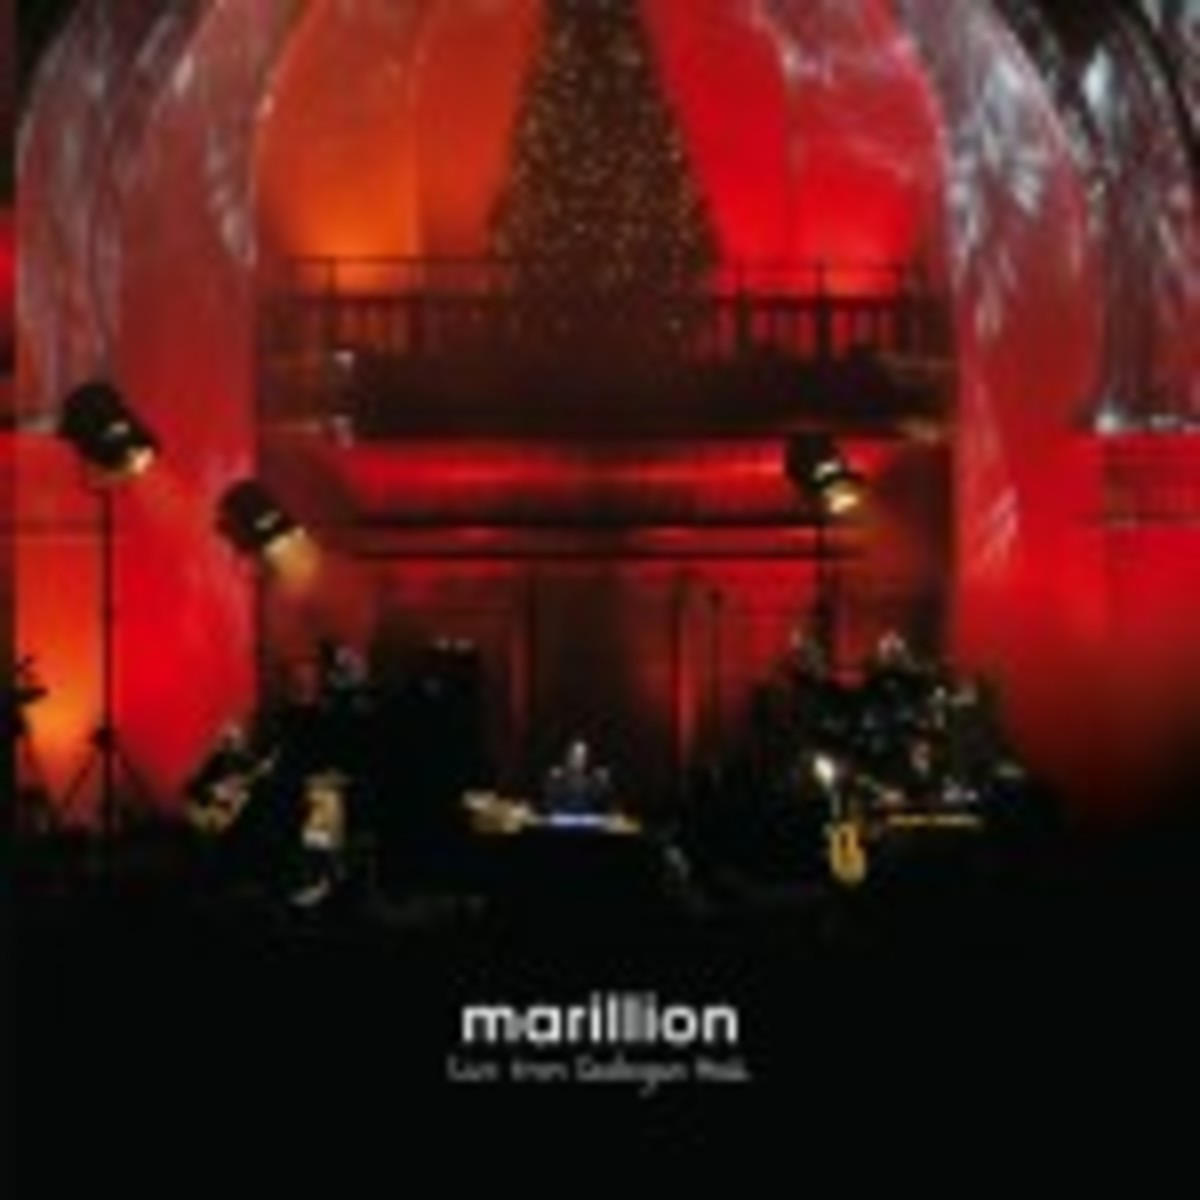 Marillion Live From Cadogan Hall CD